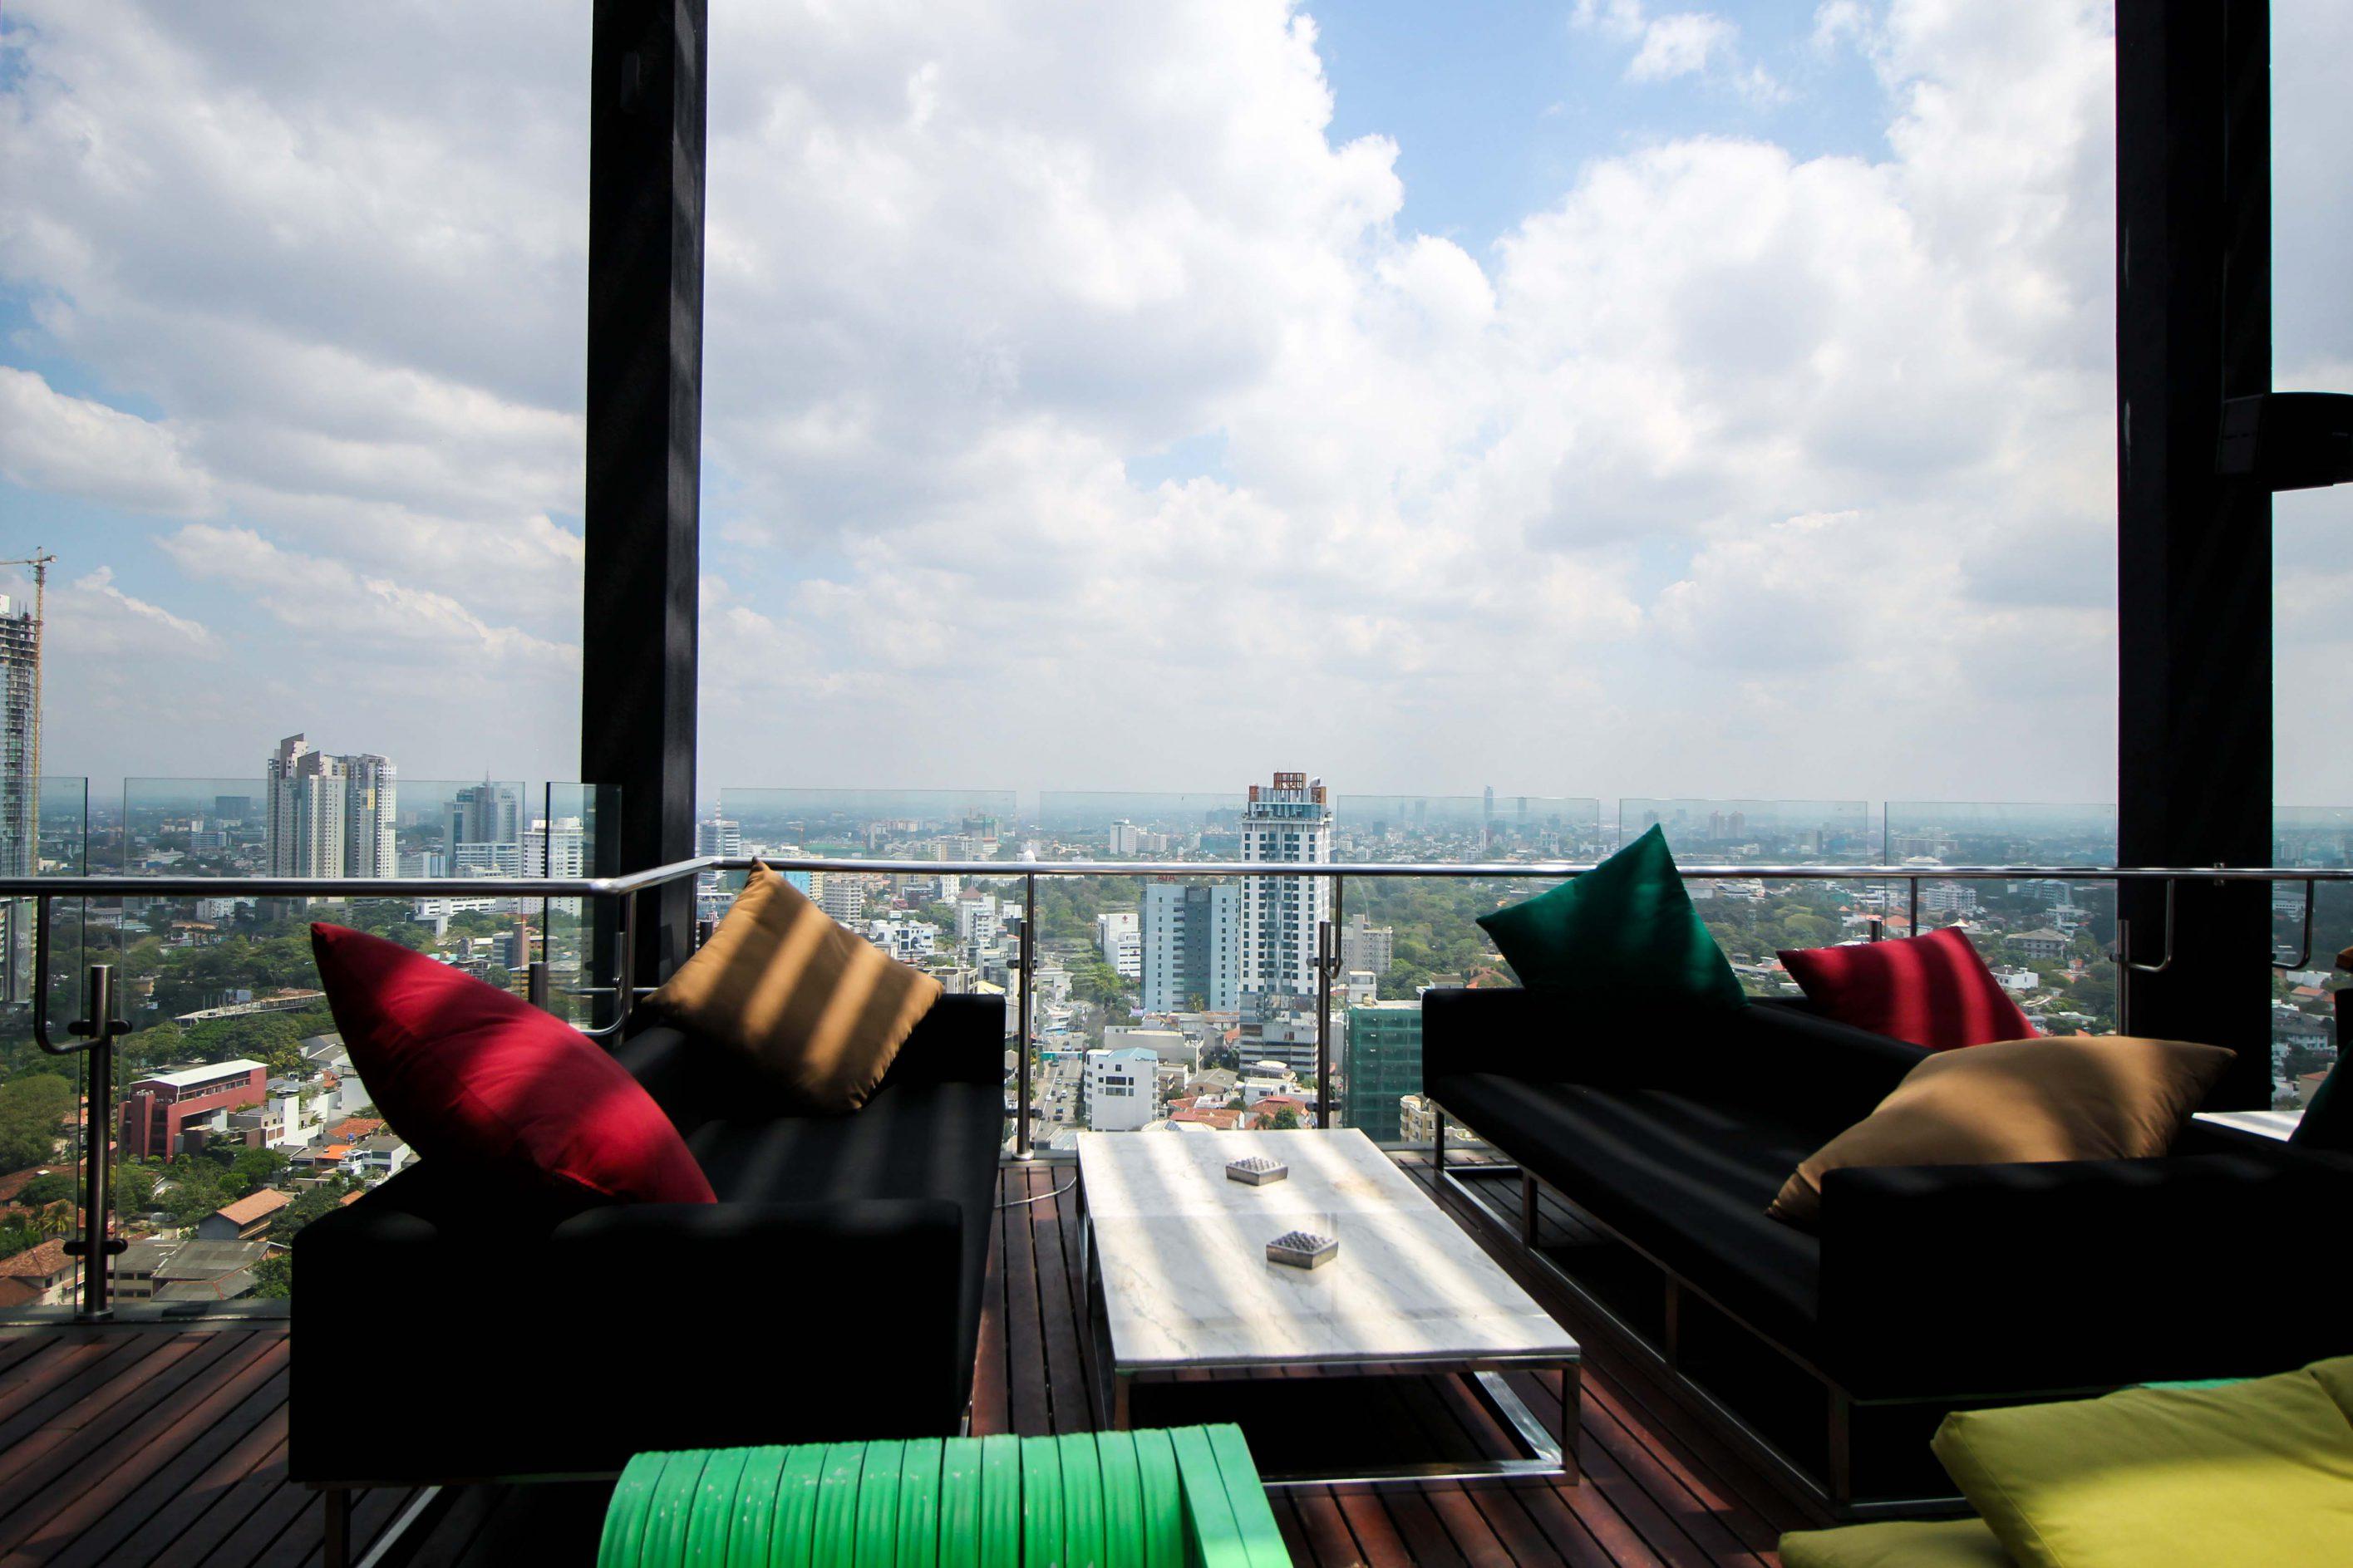 Rooftop Bar Colombo Skyline Mövenpick Colombo Hotel Reiseblog Brinisfashionbook bestes Hotel Sri Lanka 4